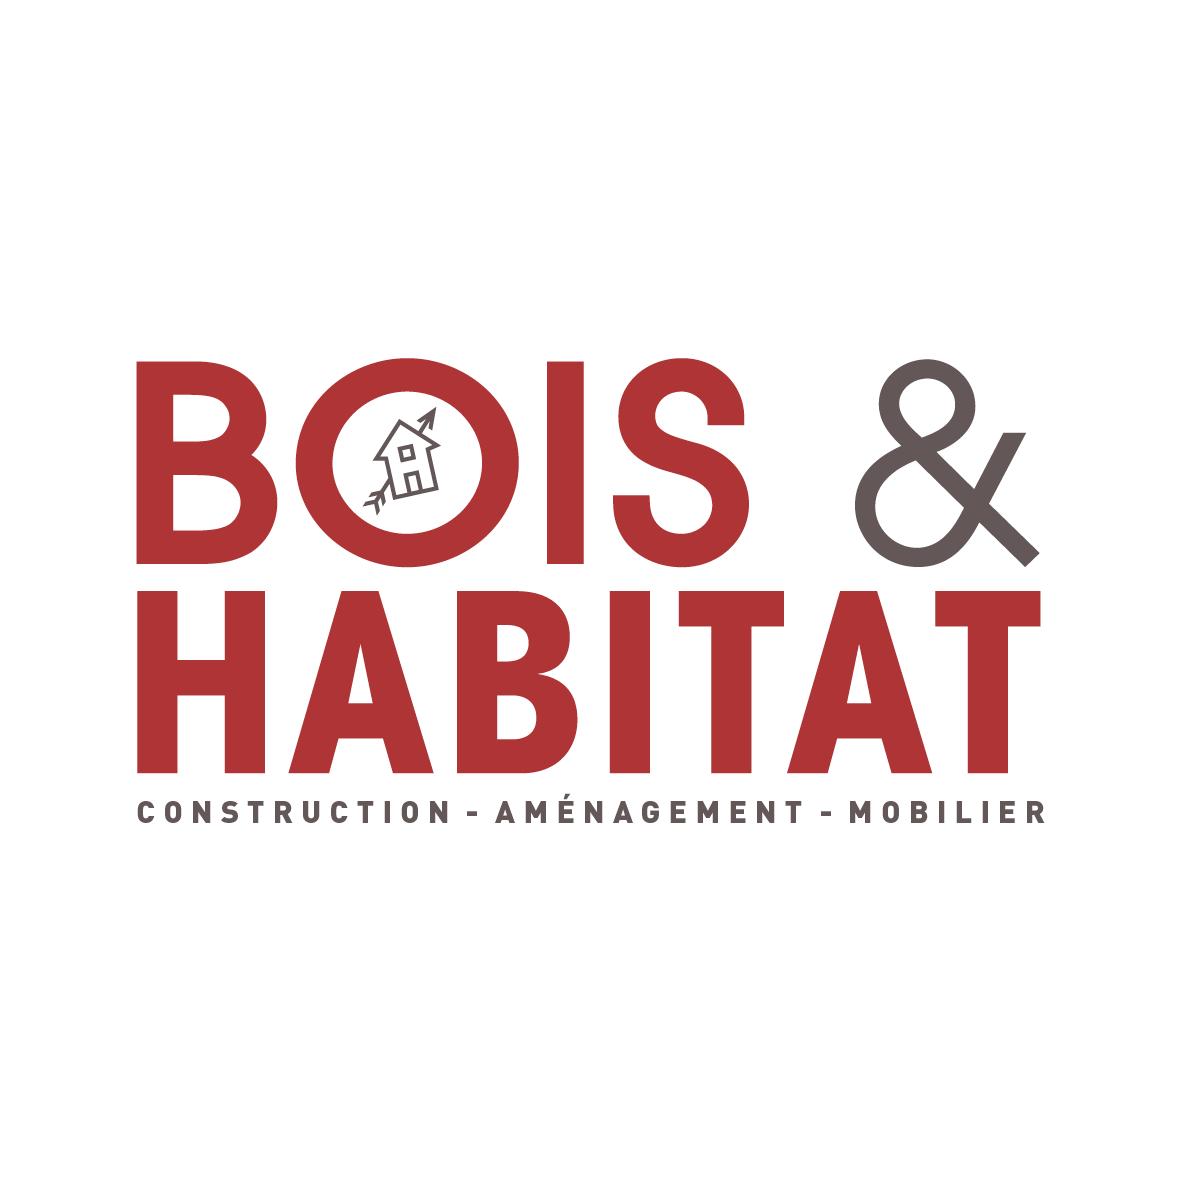 bois et habitat